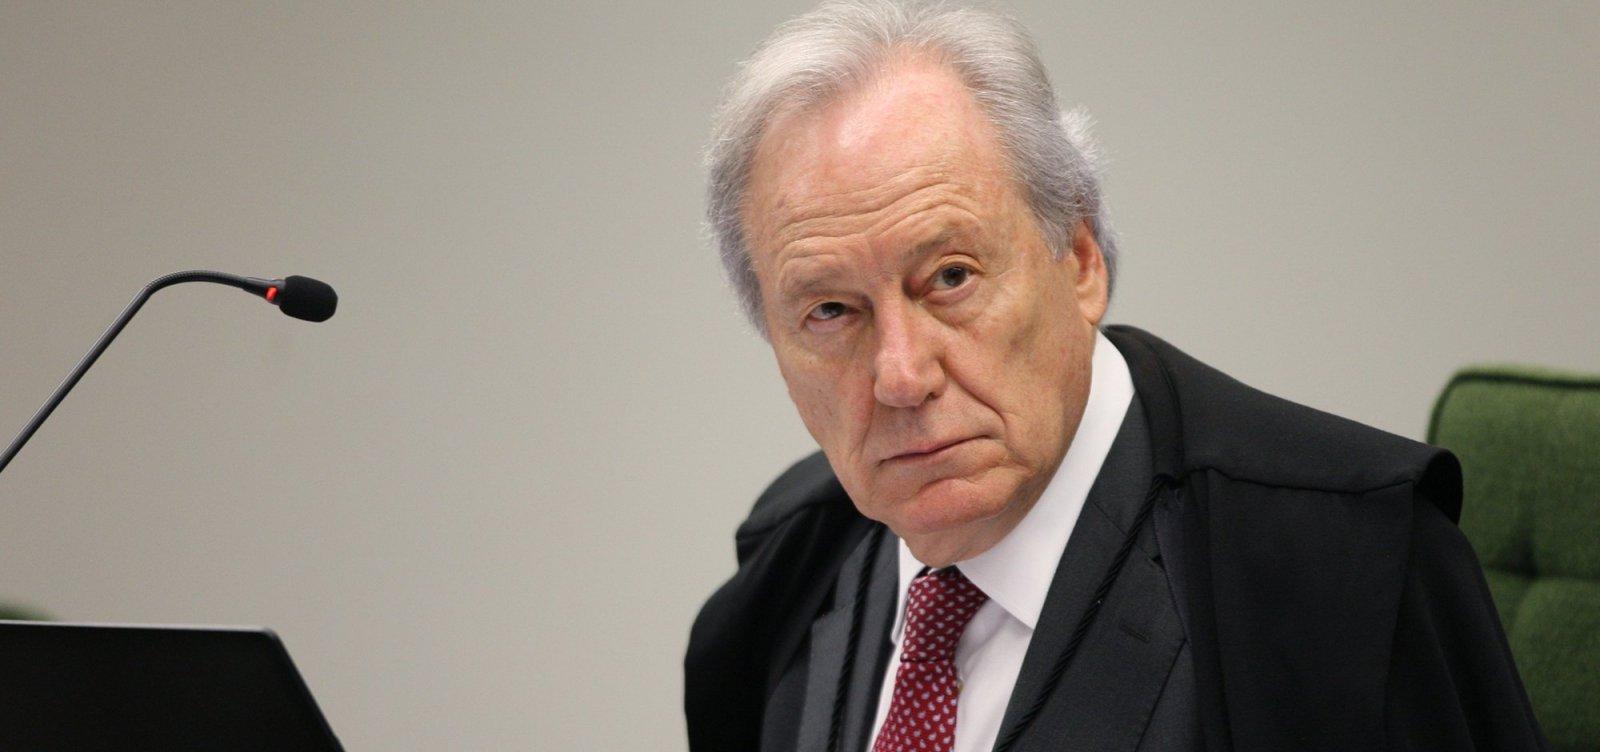 Lewandowski libera habeas corpus de Lula para julgamento no STF